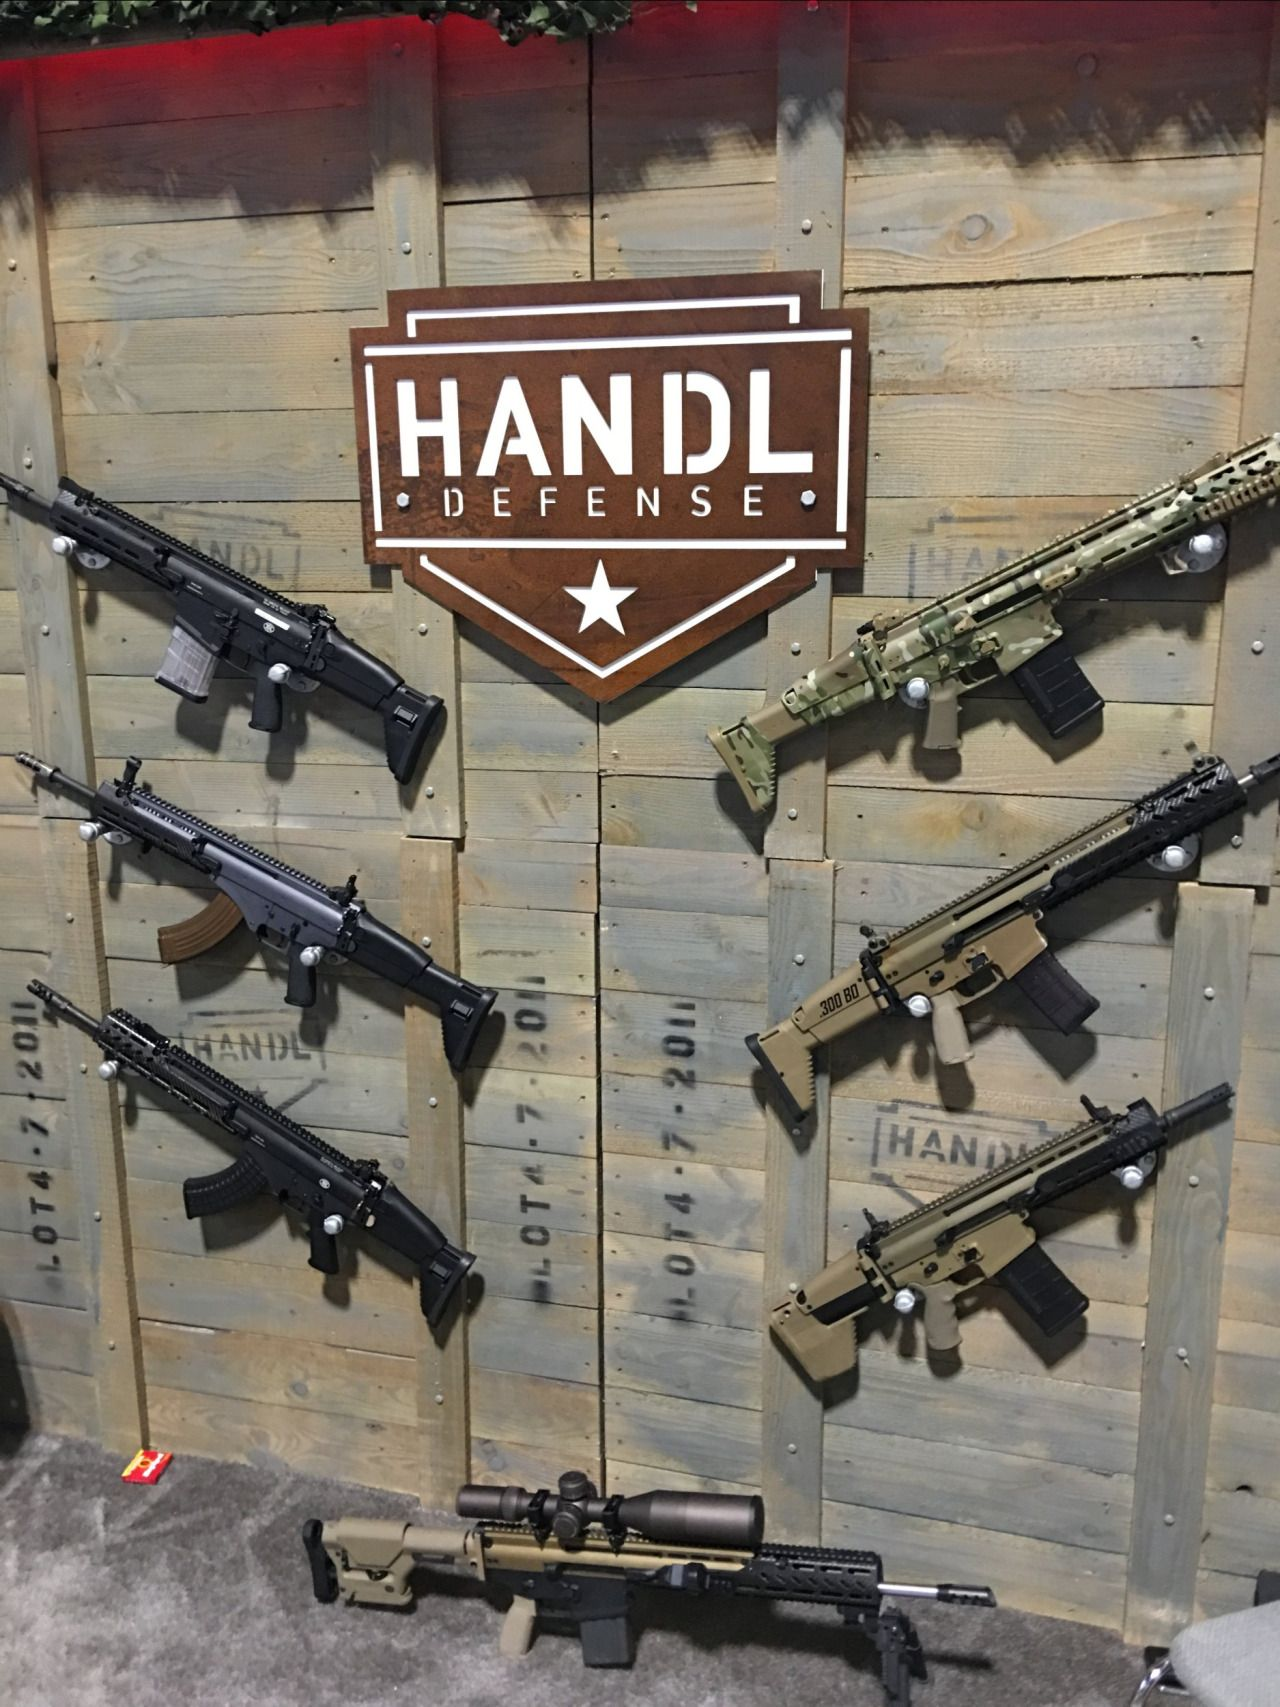 Handl Defense Modular Aftermarket FN SCAR (MK-16 and MK-17